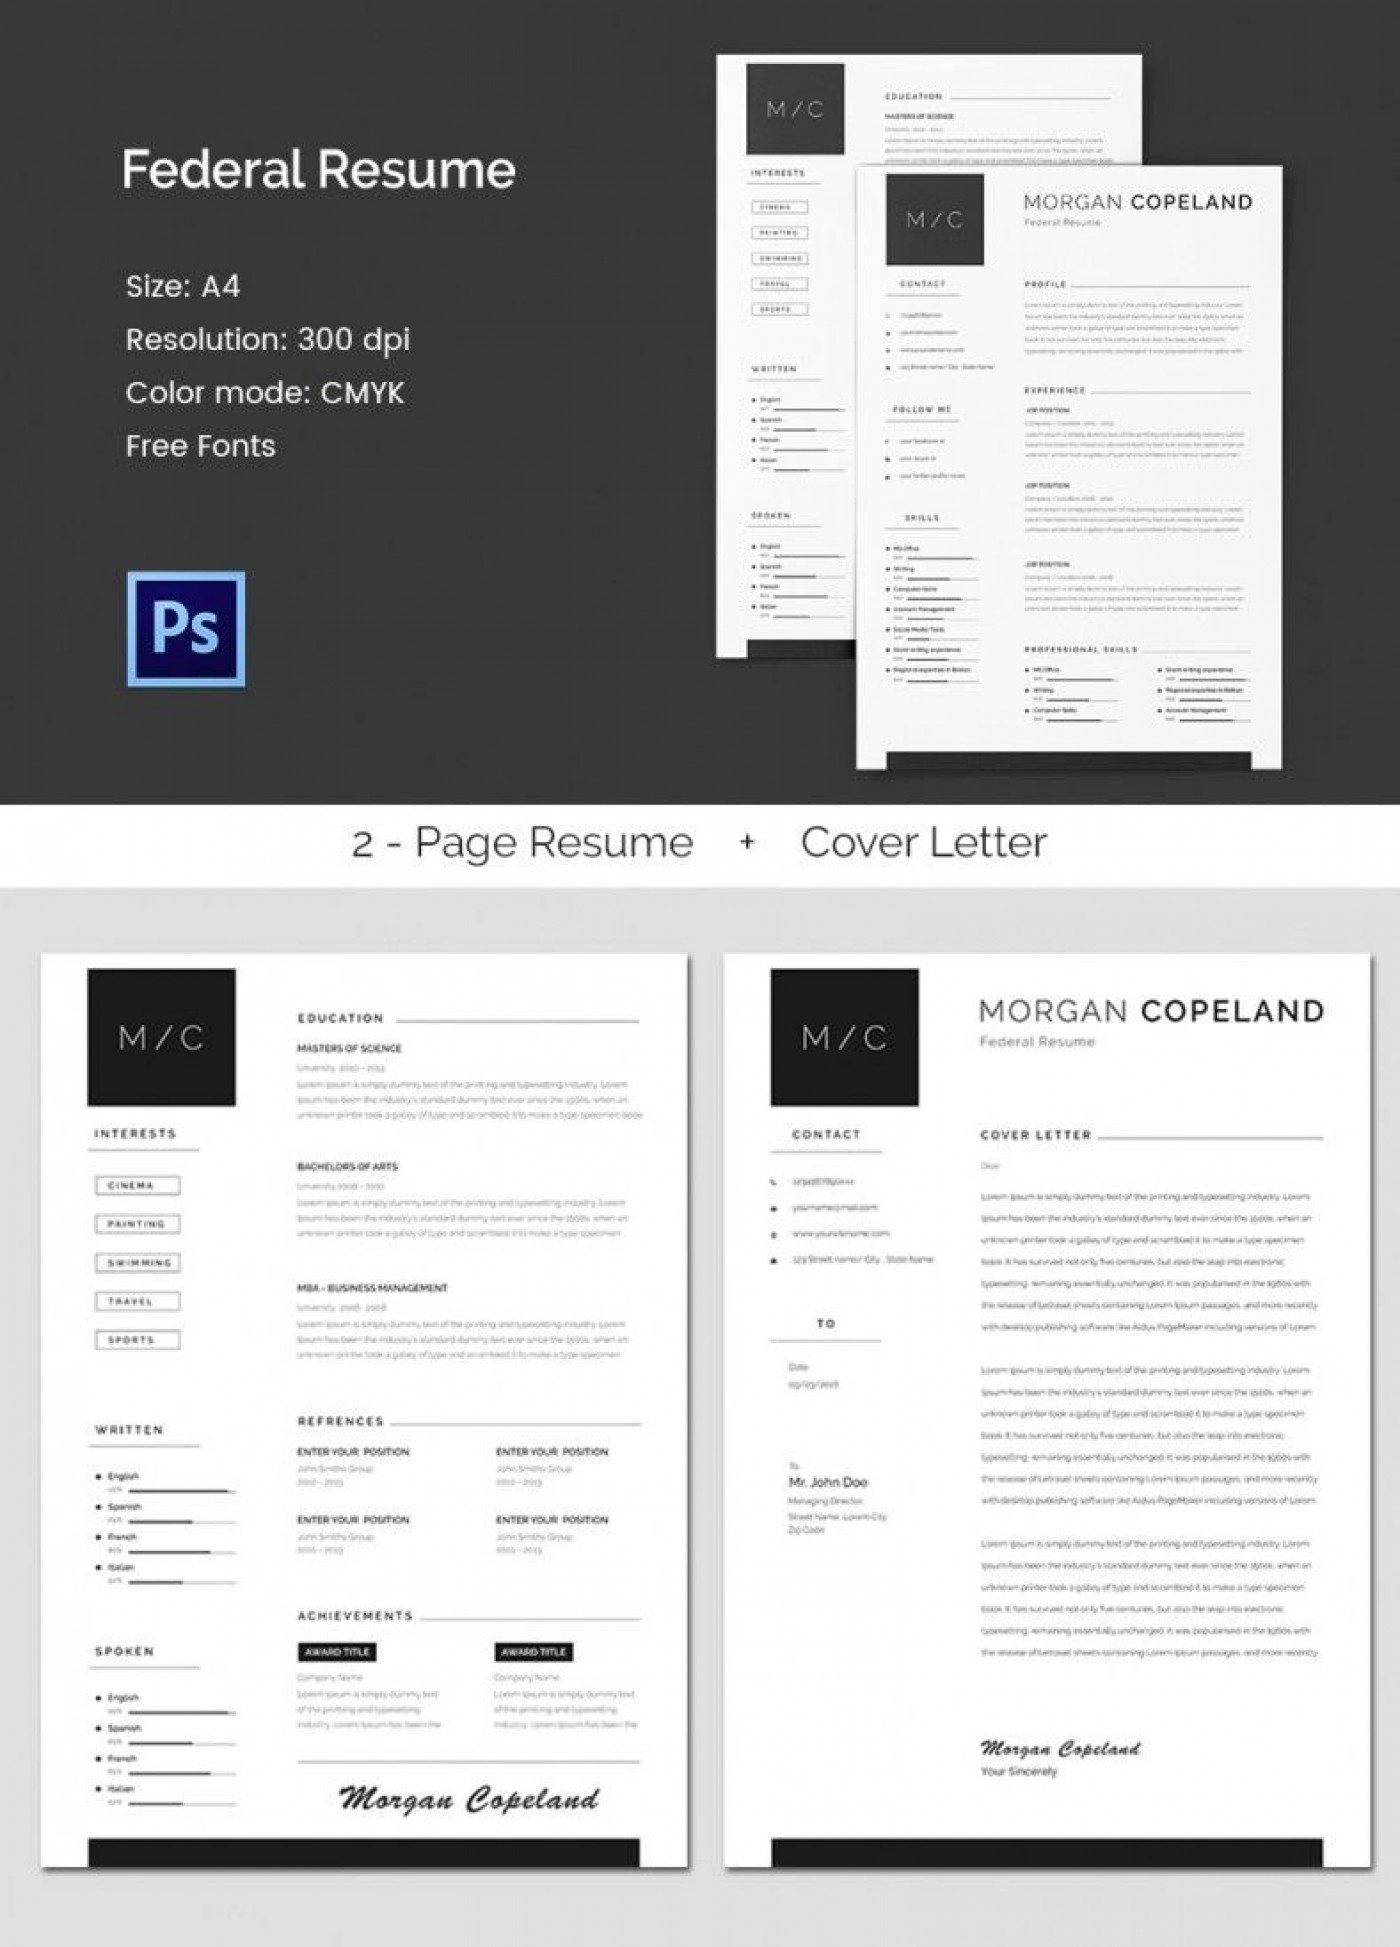 007 Fantastic Software Engineering Resume Template Highest Clarity  Engineer Microsoft Word Cv Free Developer Download1400